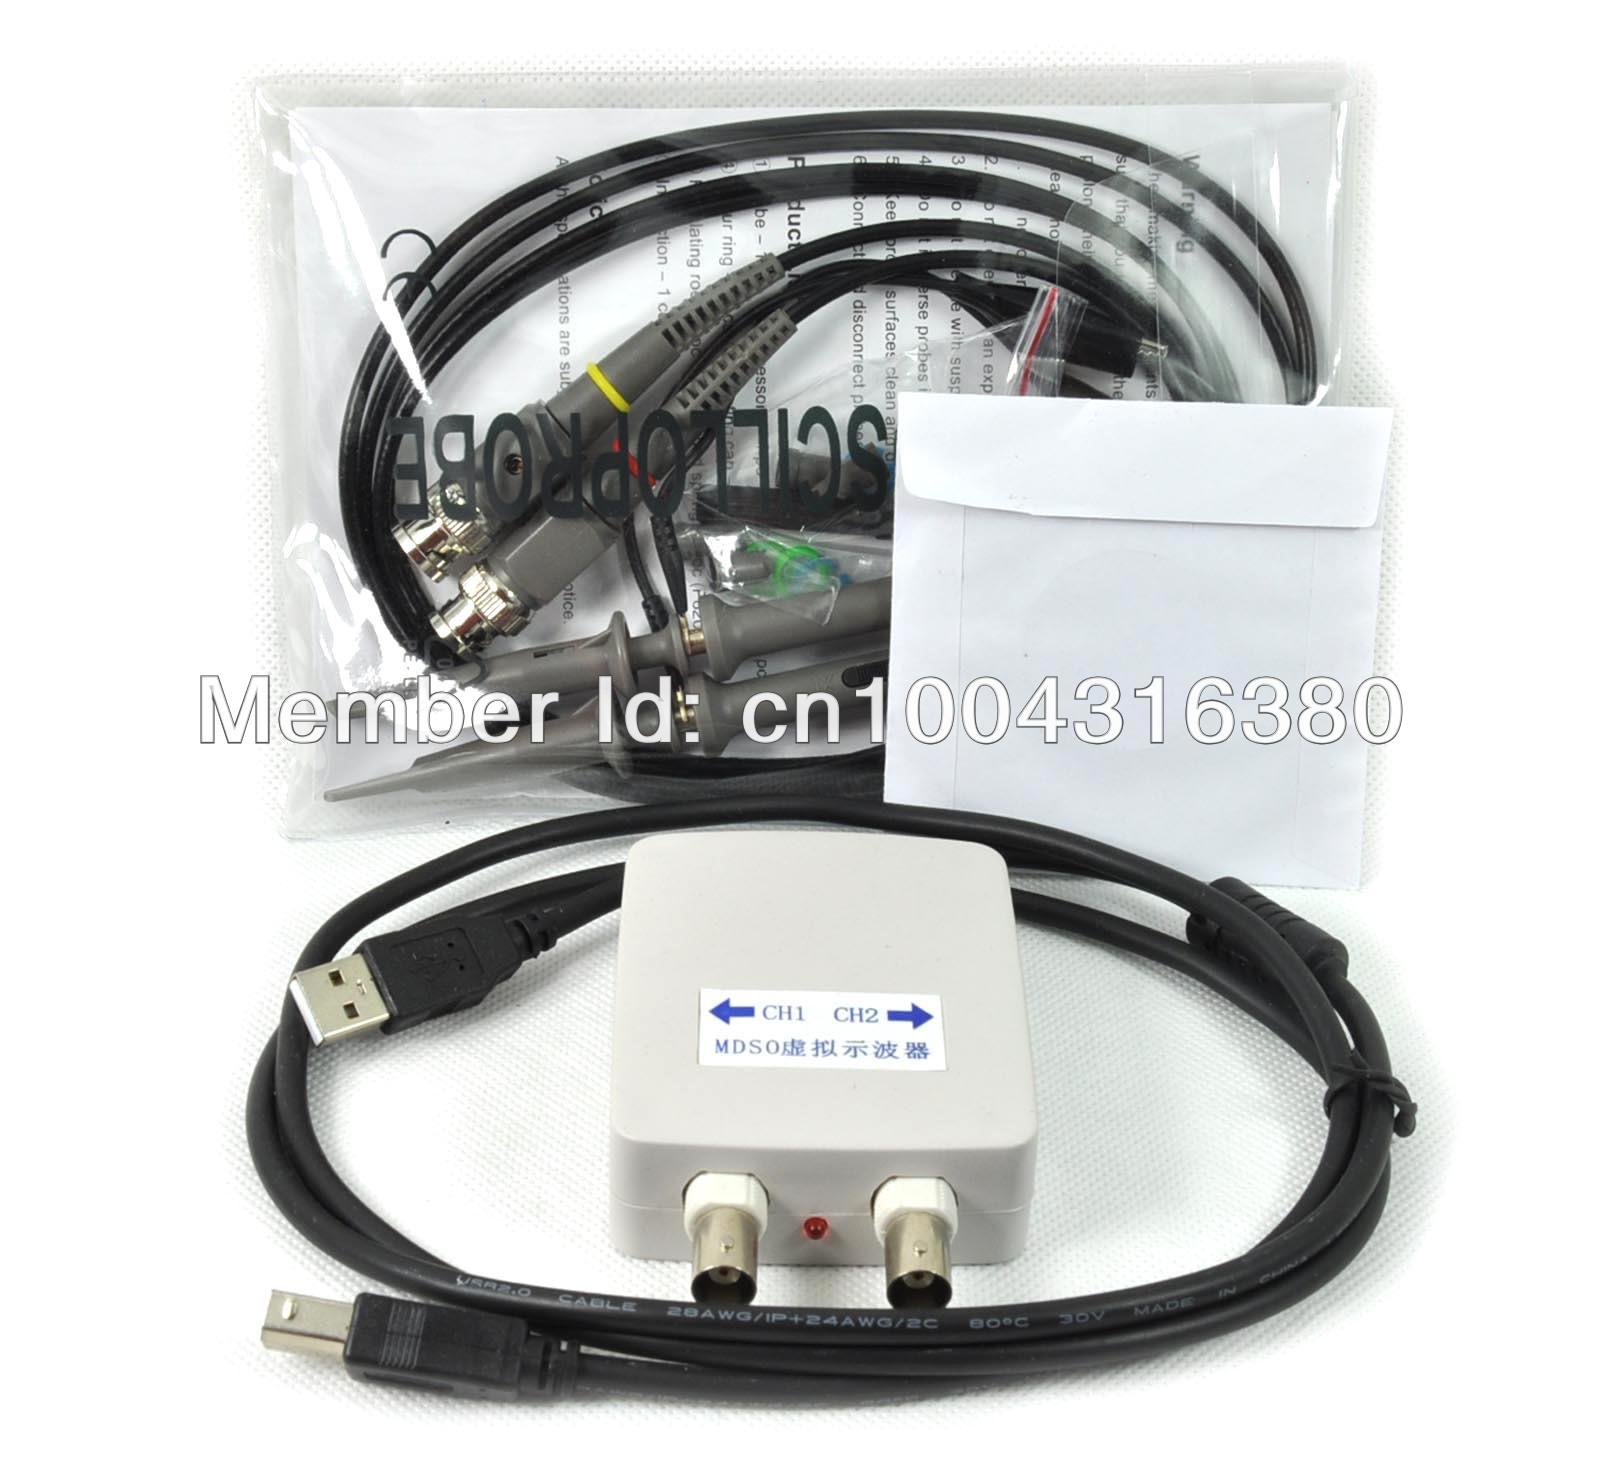 O007 MDSO PC USB oscilloscope kit Virtual analog oscilloscope Bandwidth 20M Sampling rate 48M With dual probe FREE SHIPPING(China (Mainland))